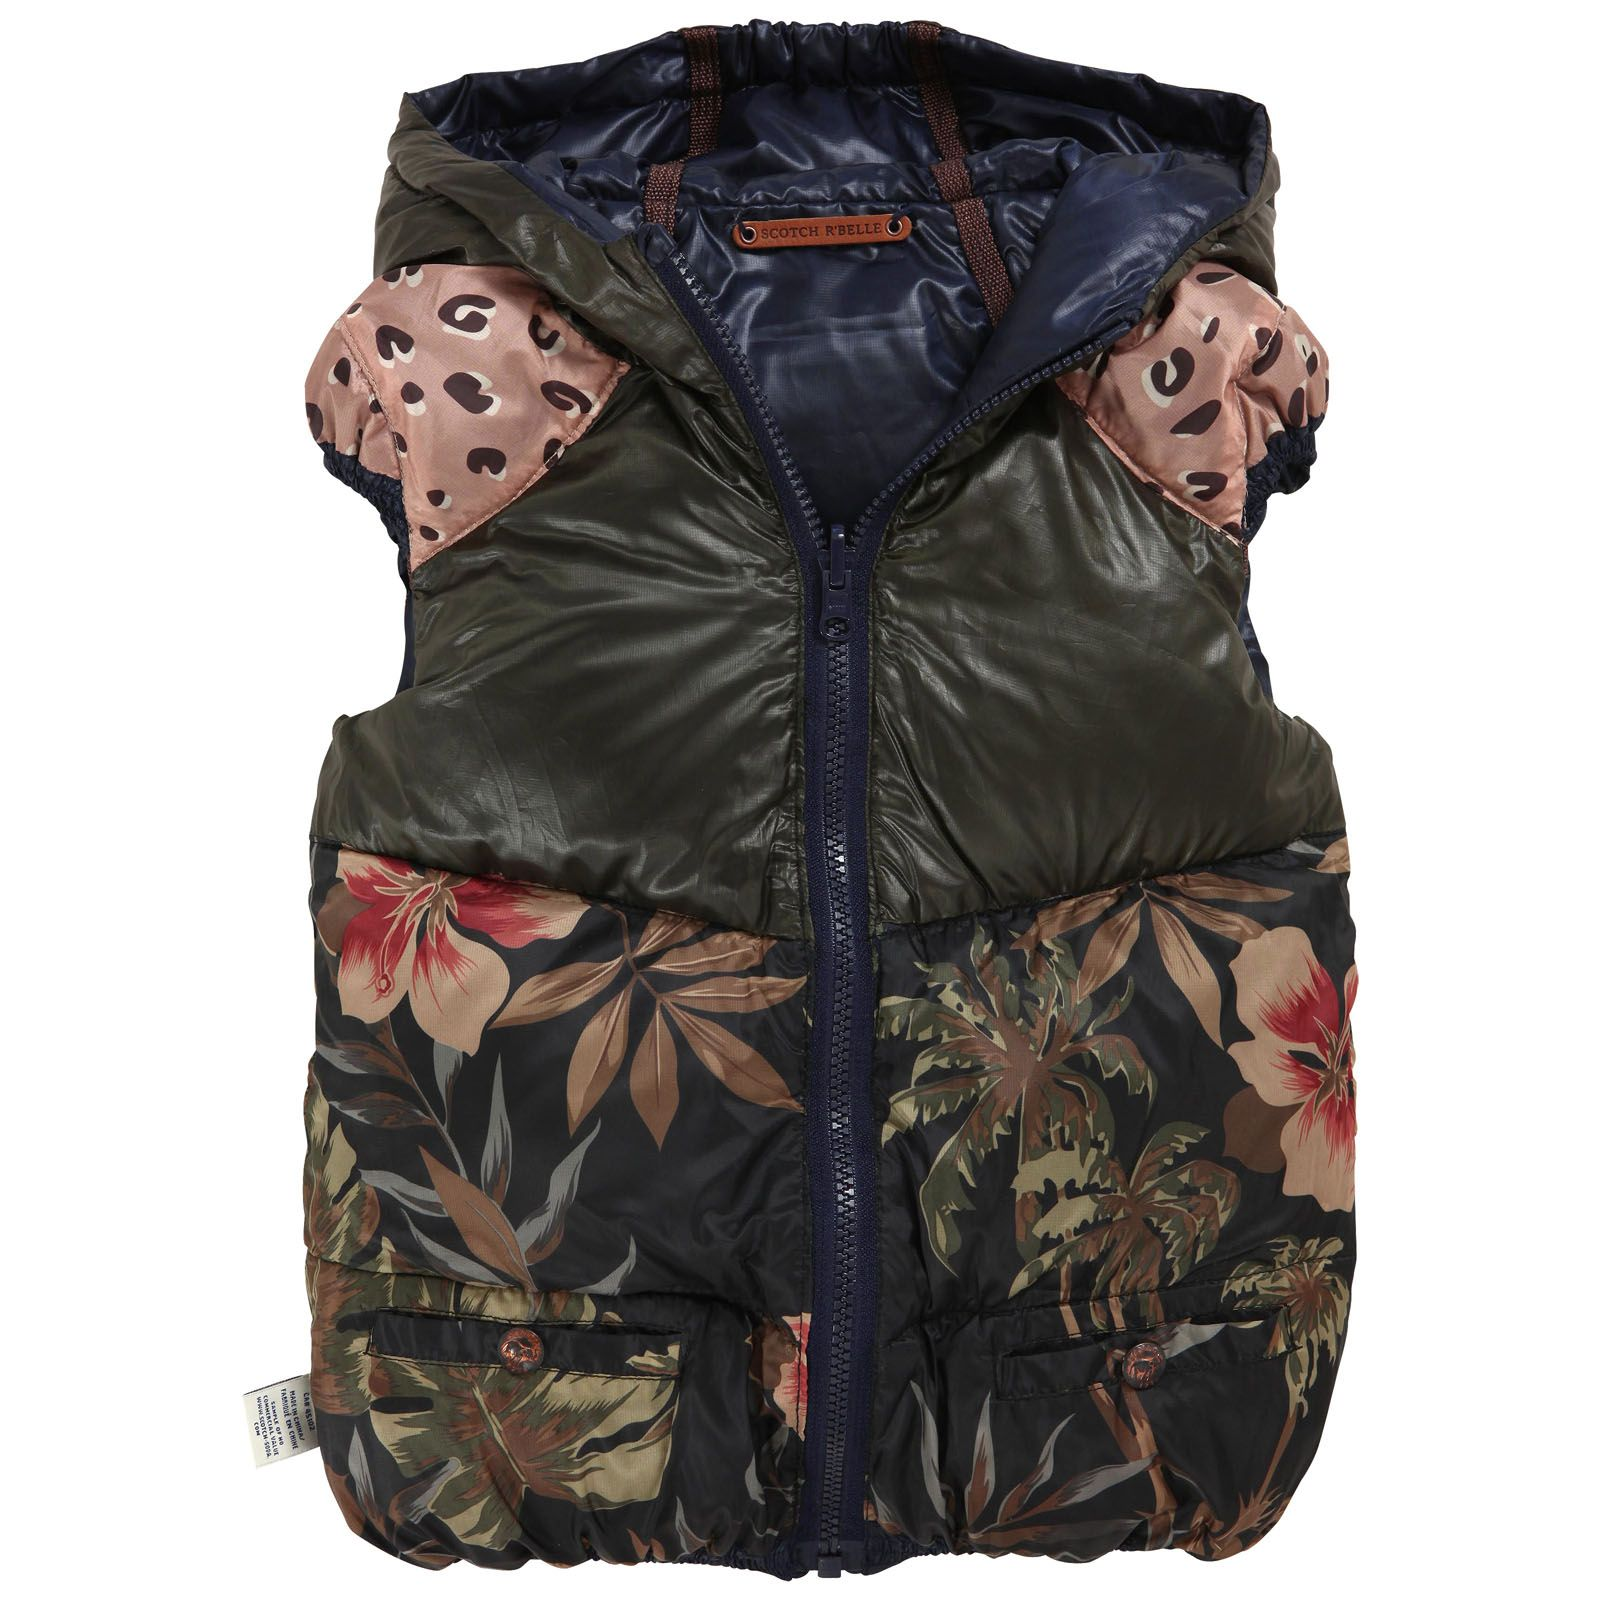 reversible sleeveless waterproof jacket one navy blue side and